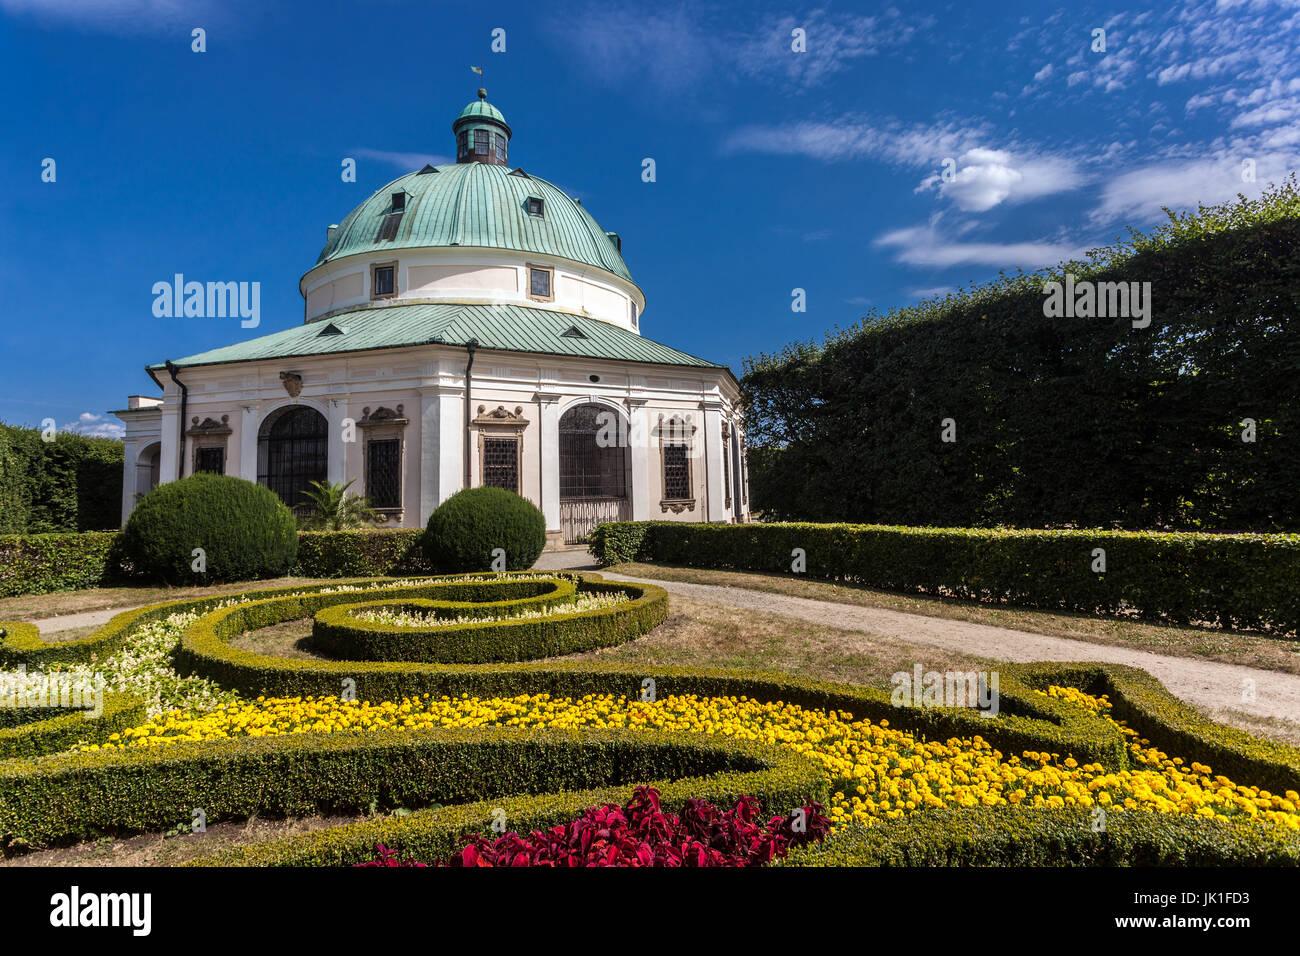 Baroque Rotunda in Pleasure Garden Kromeriz UNESCO City Moravia